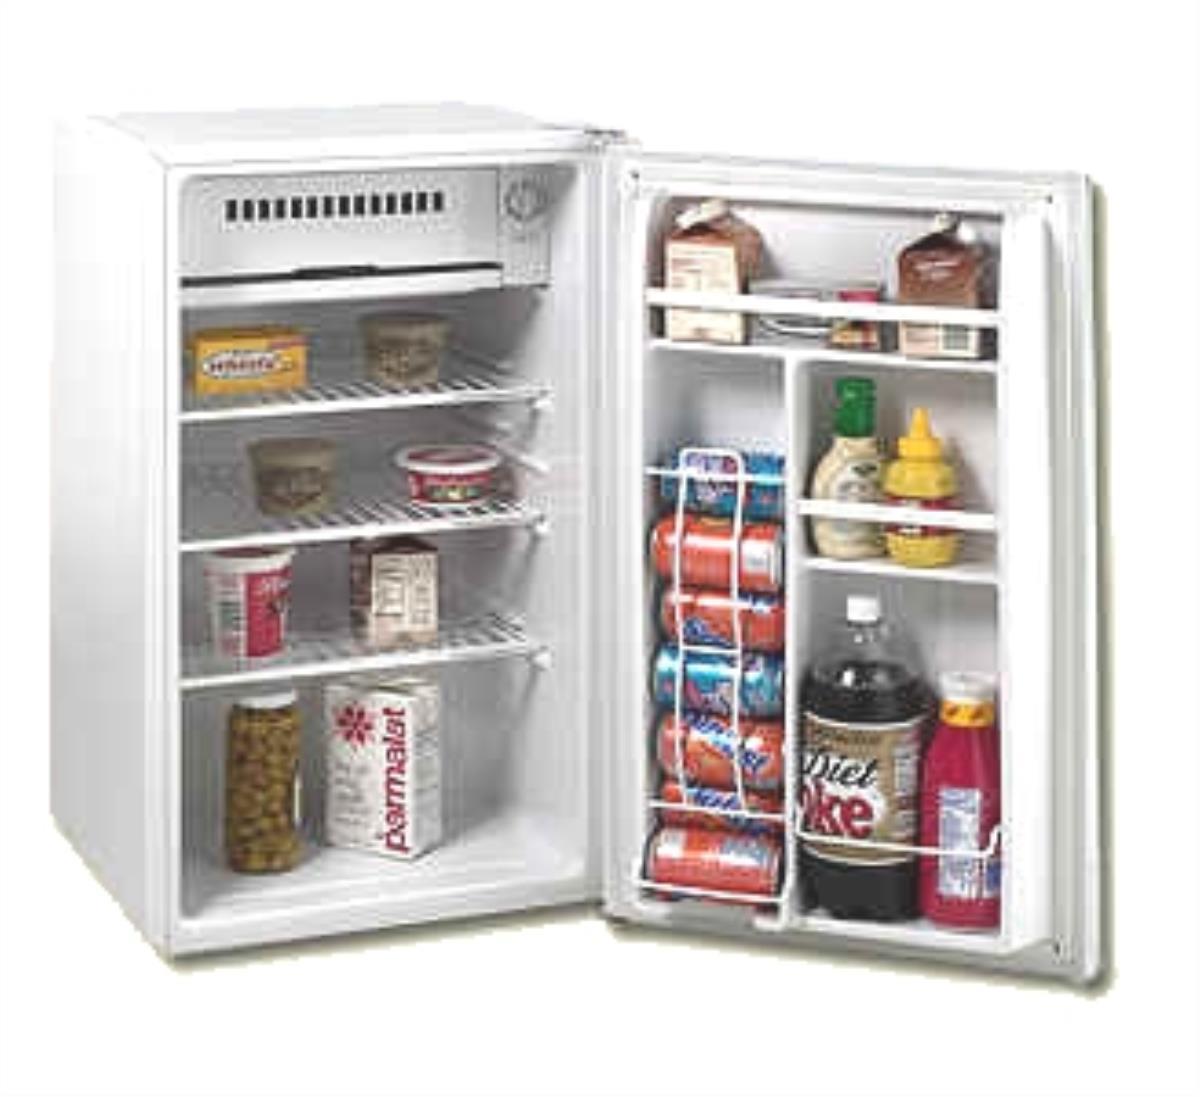 Avanti Refrigerator | Avanti Appliances | Avanti 7.4 Cu Ft Refrigerator